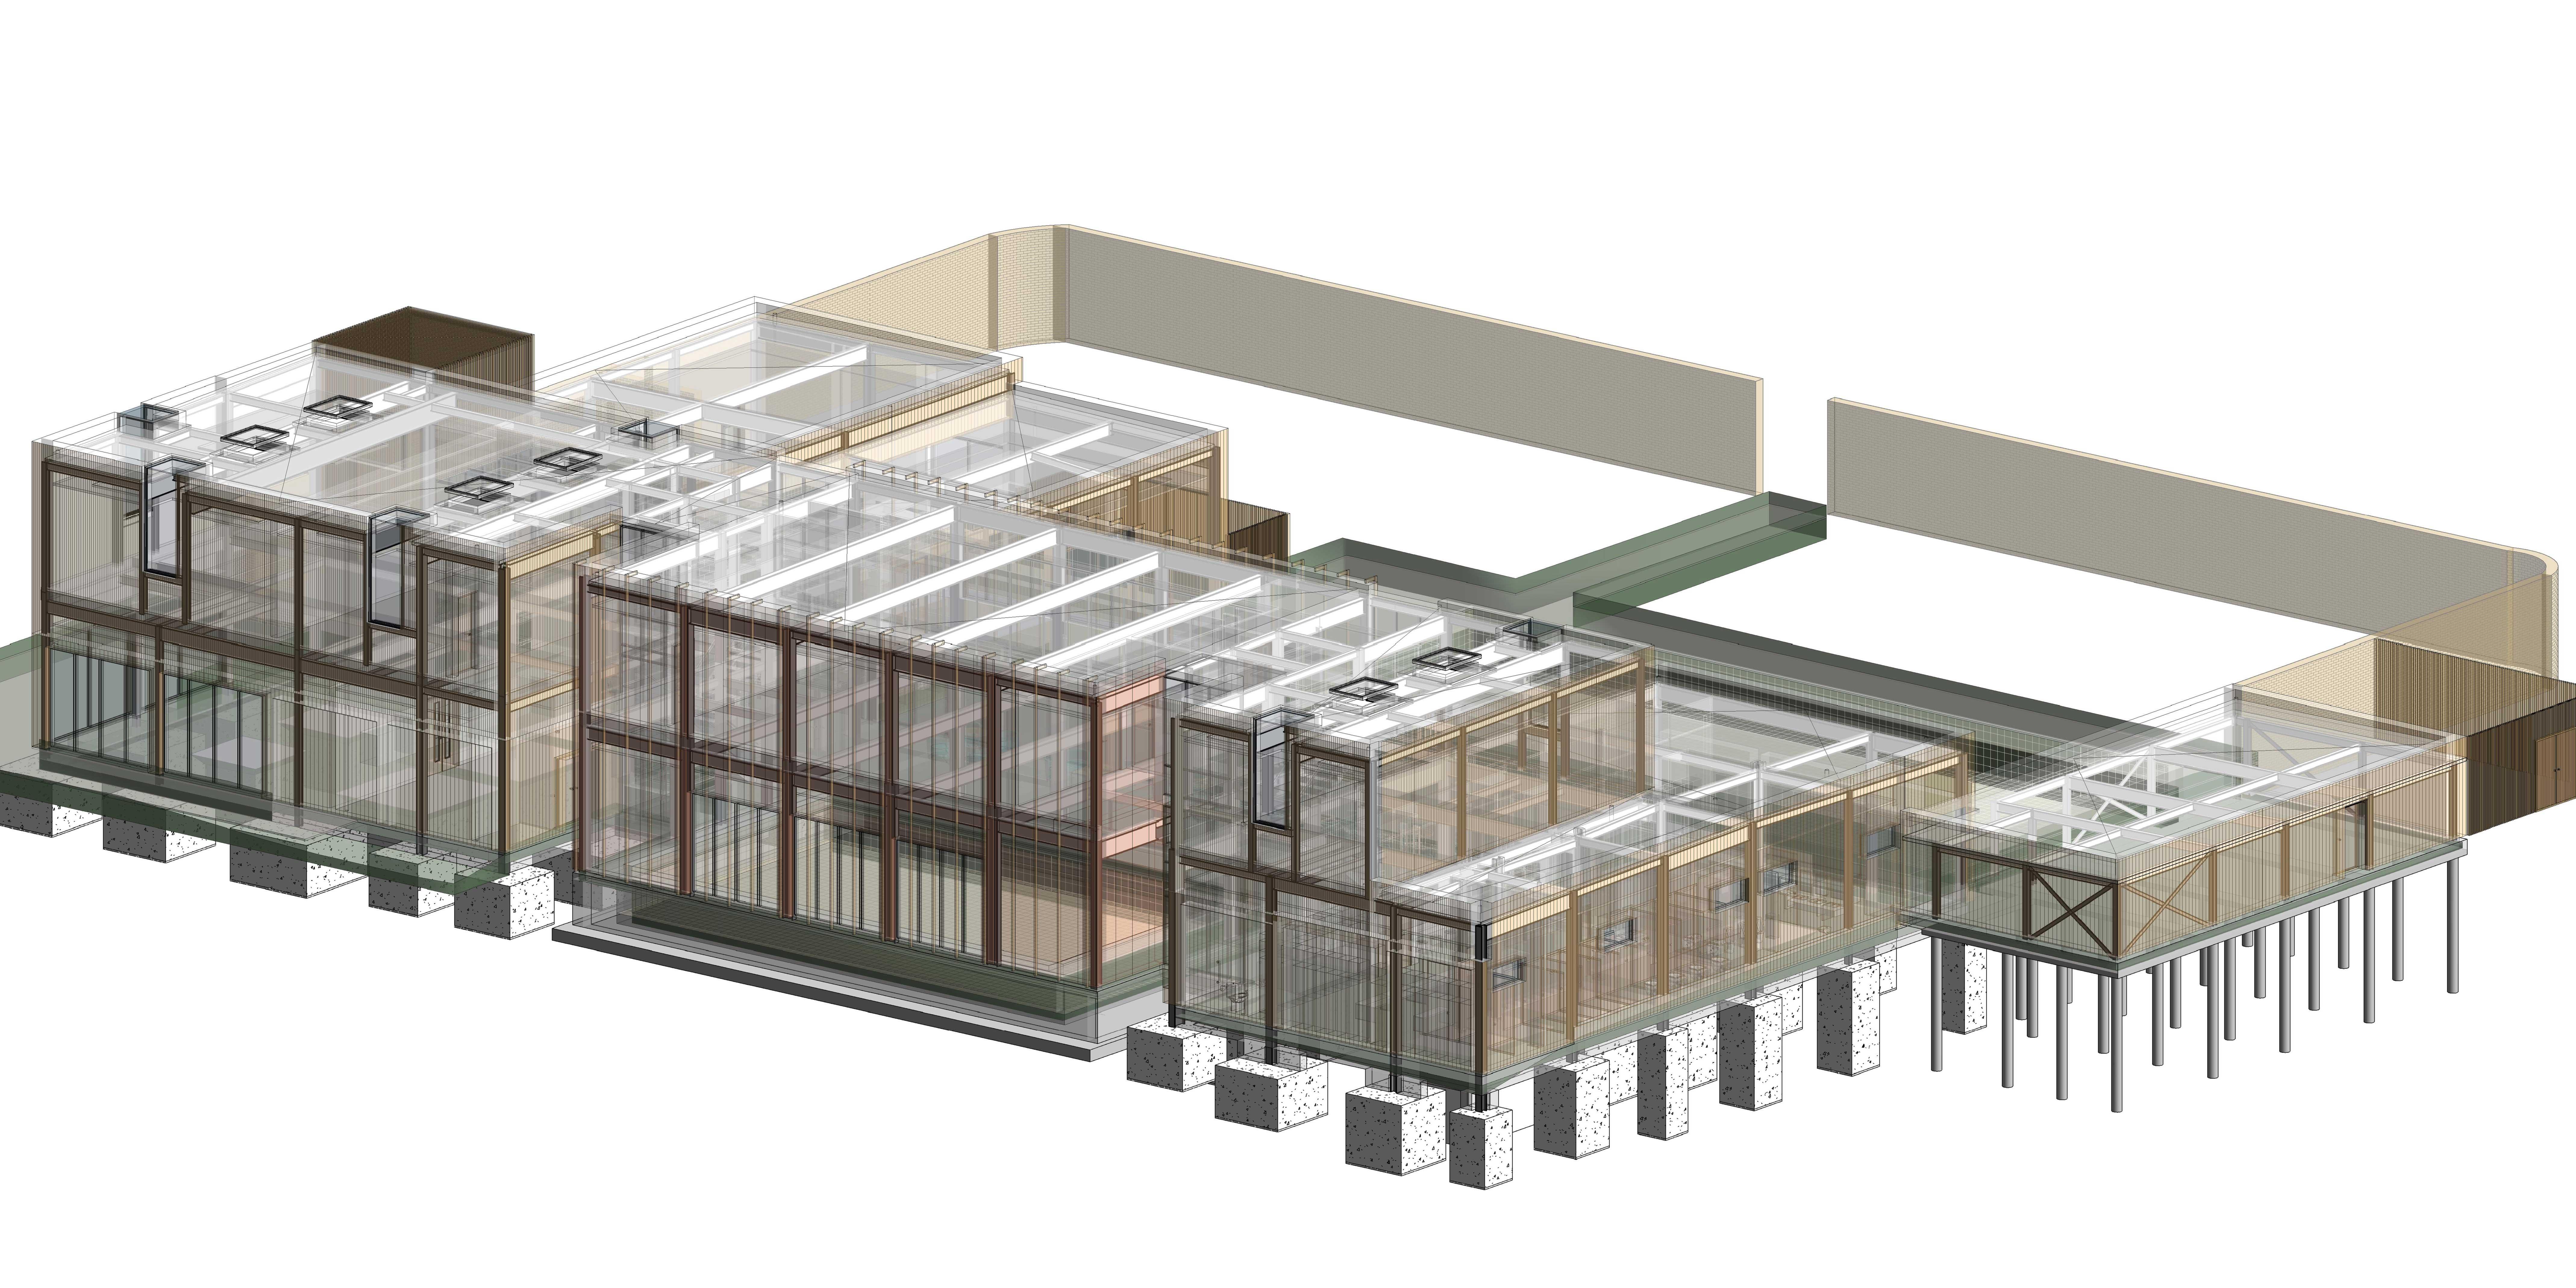 Foxhills Combined Model